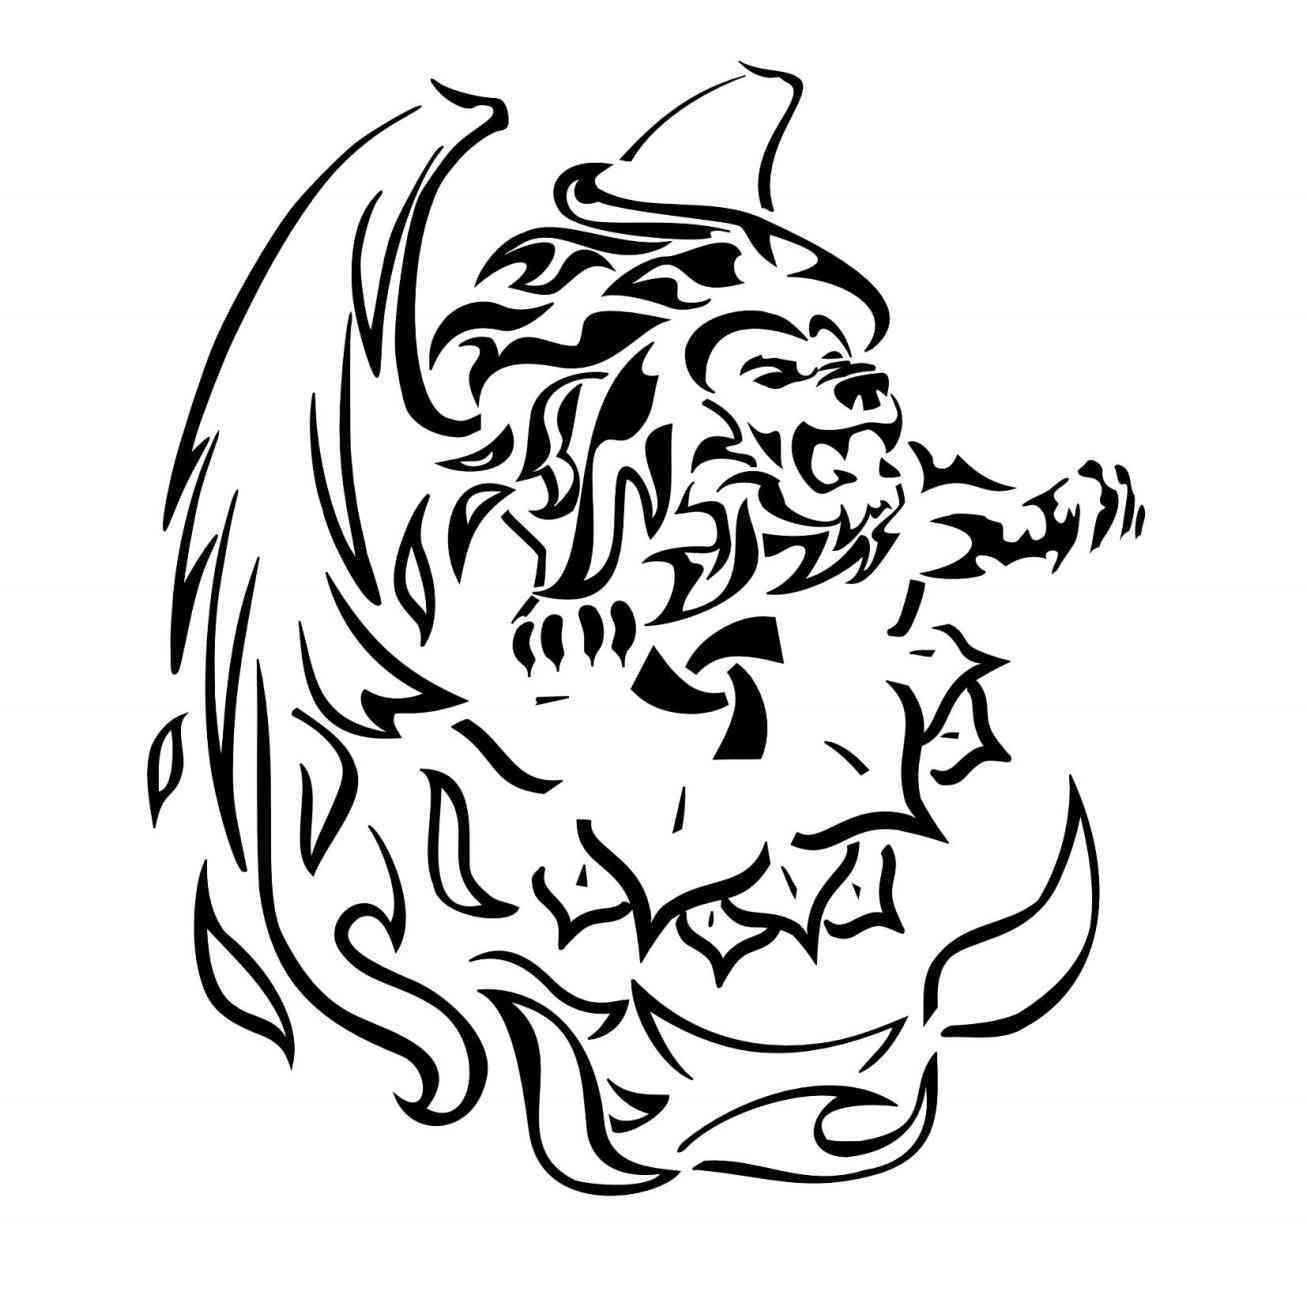 1307x1307 Simple Lion Tattoos Designs Mayamokacomm